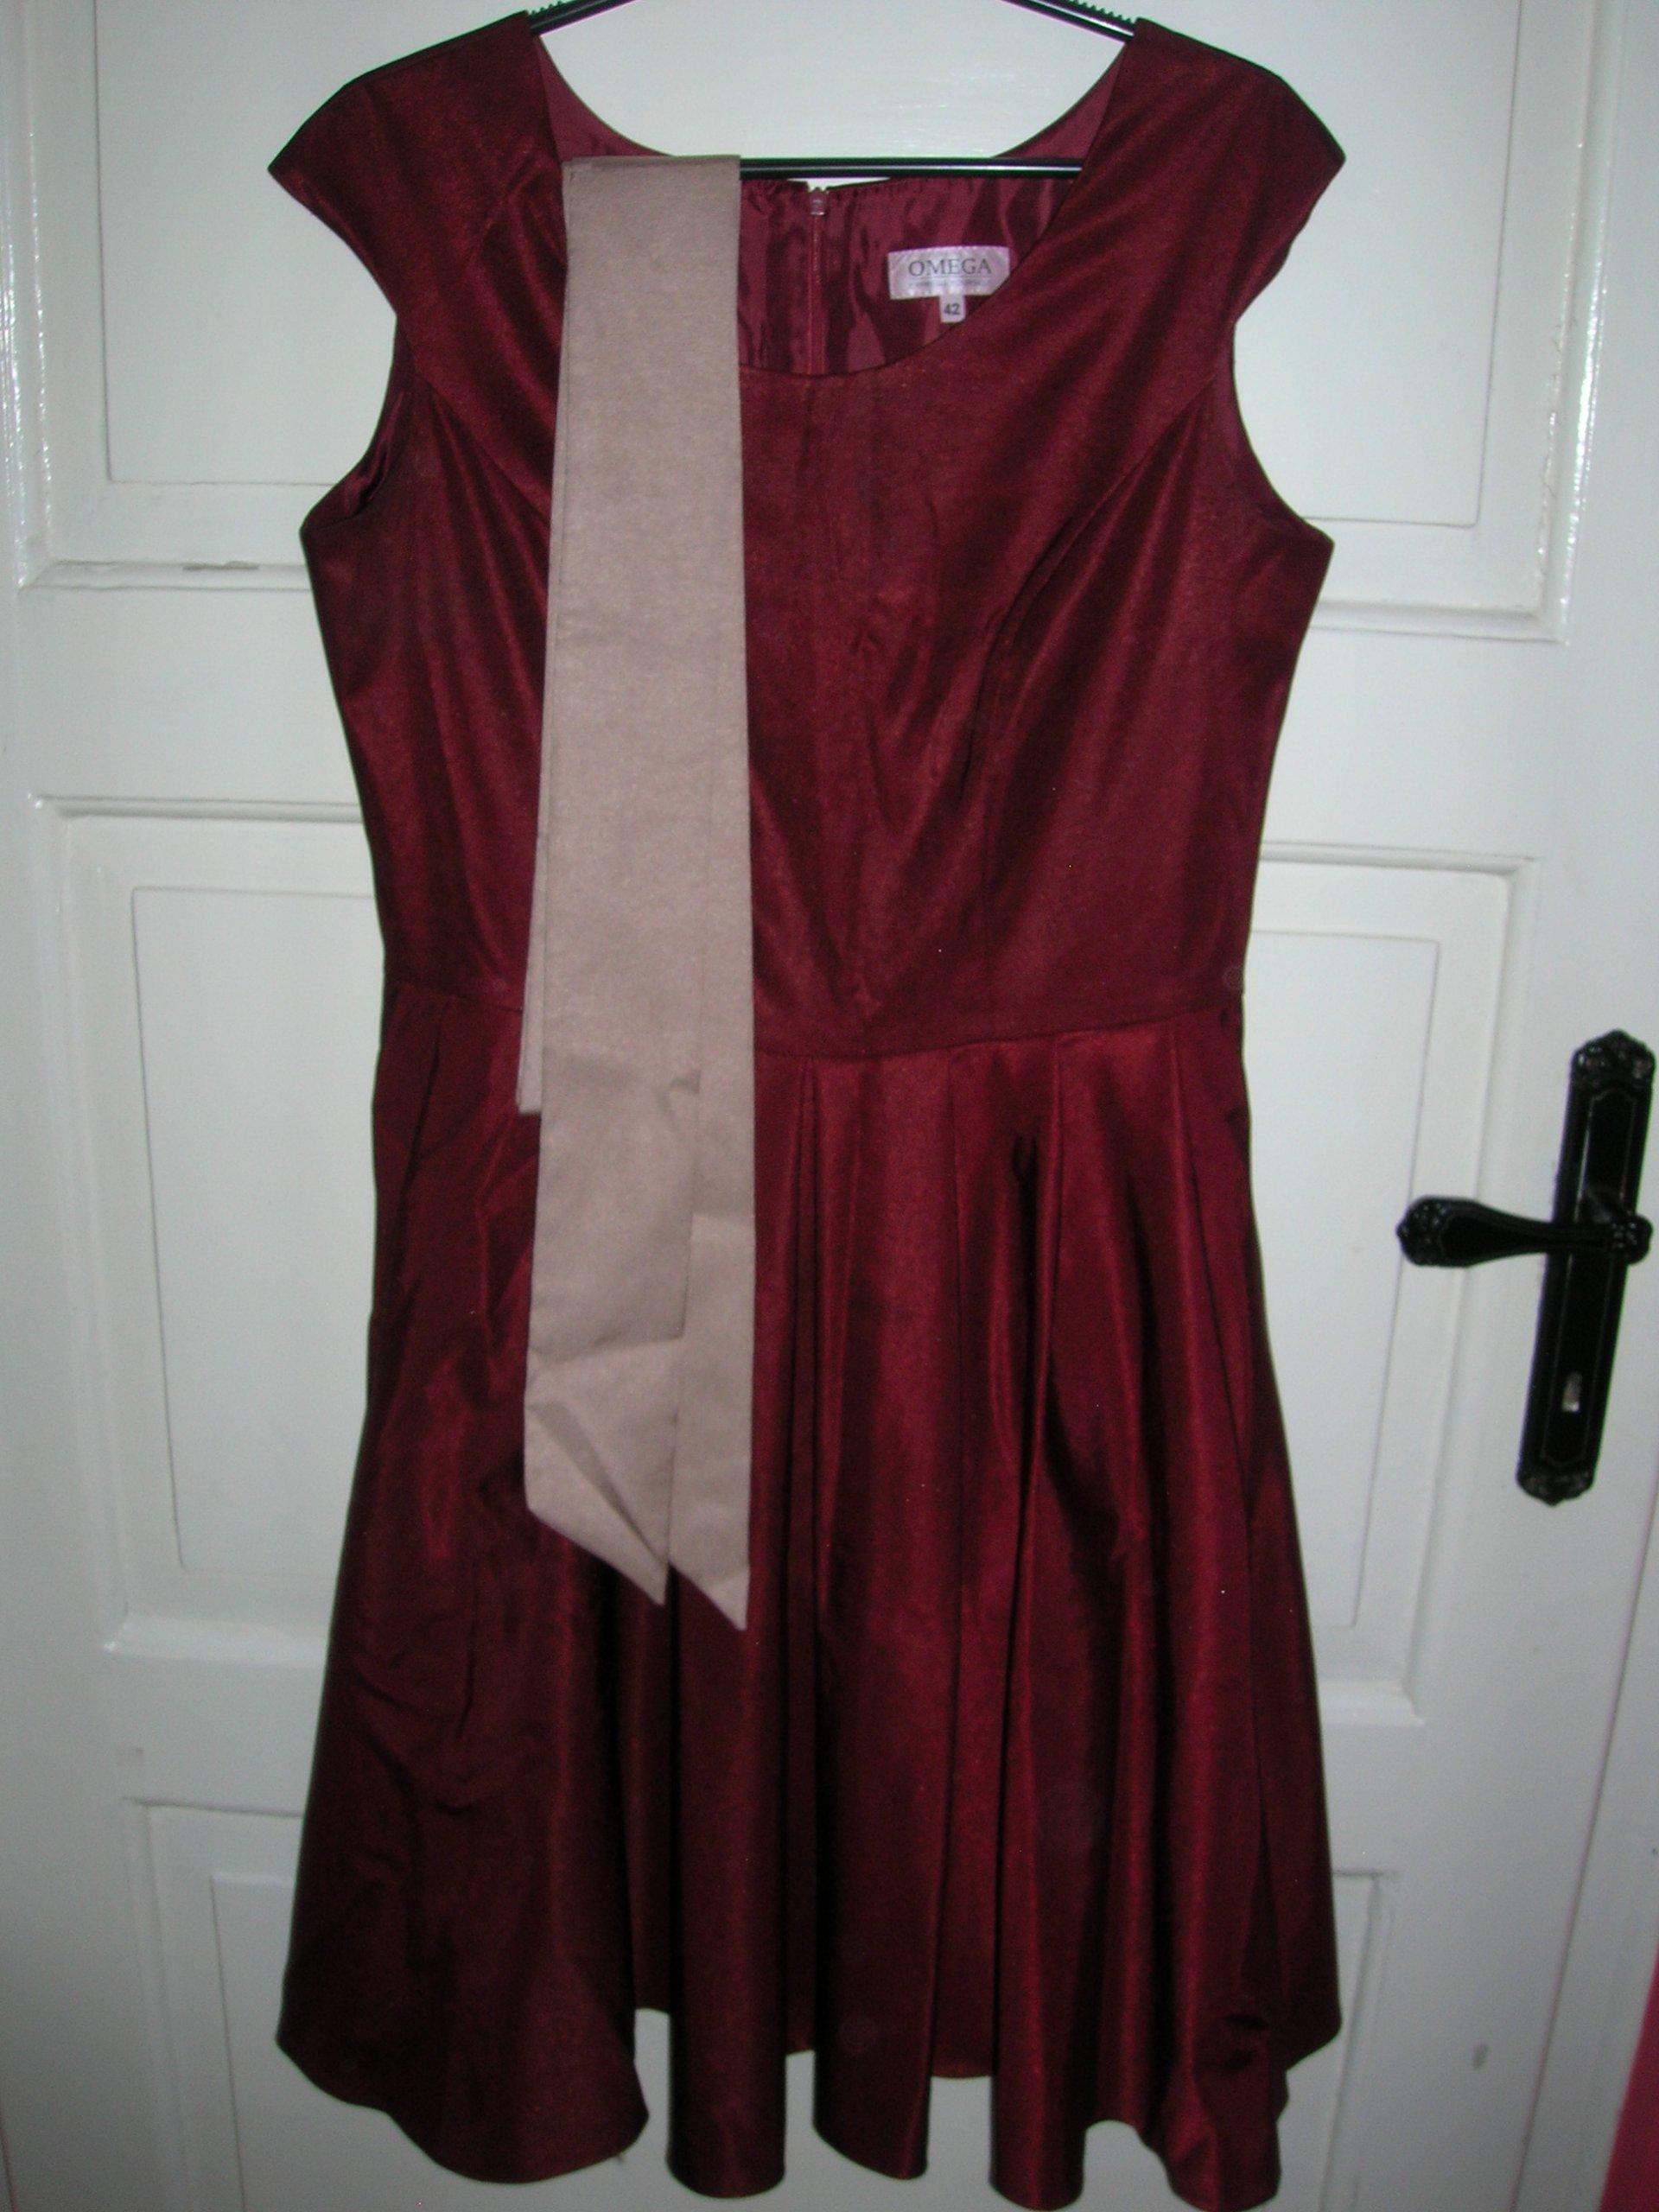 c7e9c50e51 Sukienka rozkloszowana idealna na wesele - 7410490342 - oficjalne ...